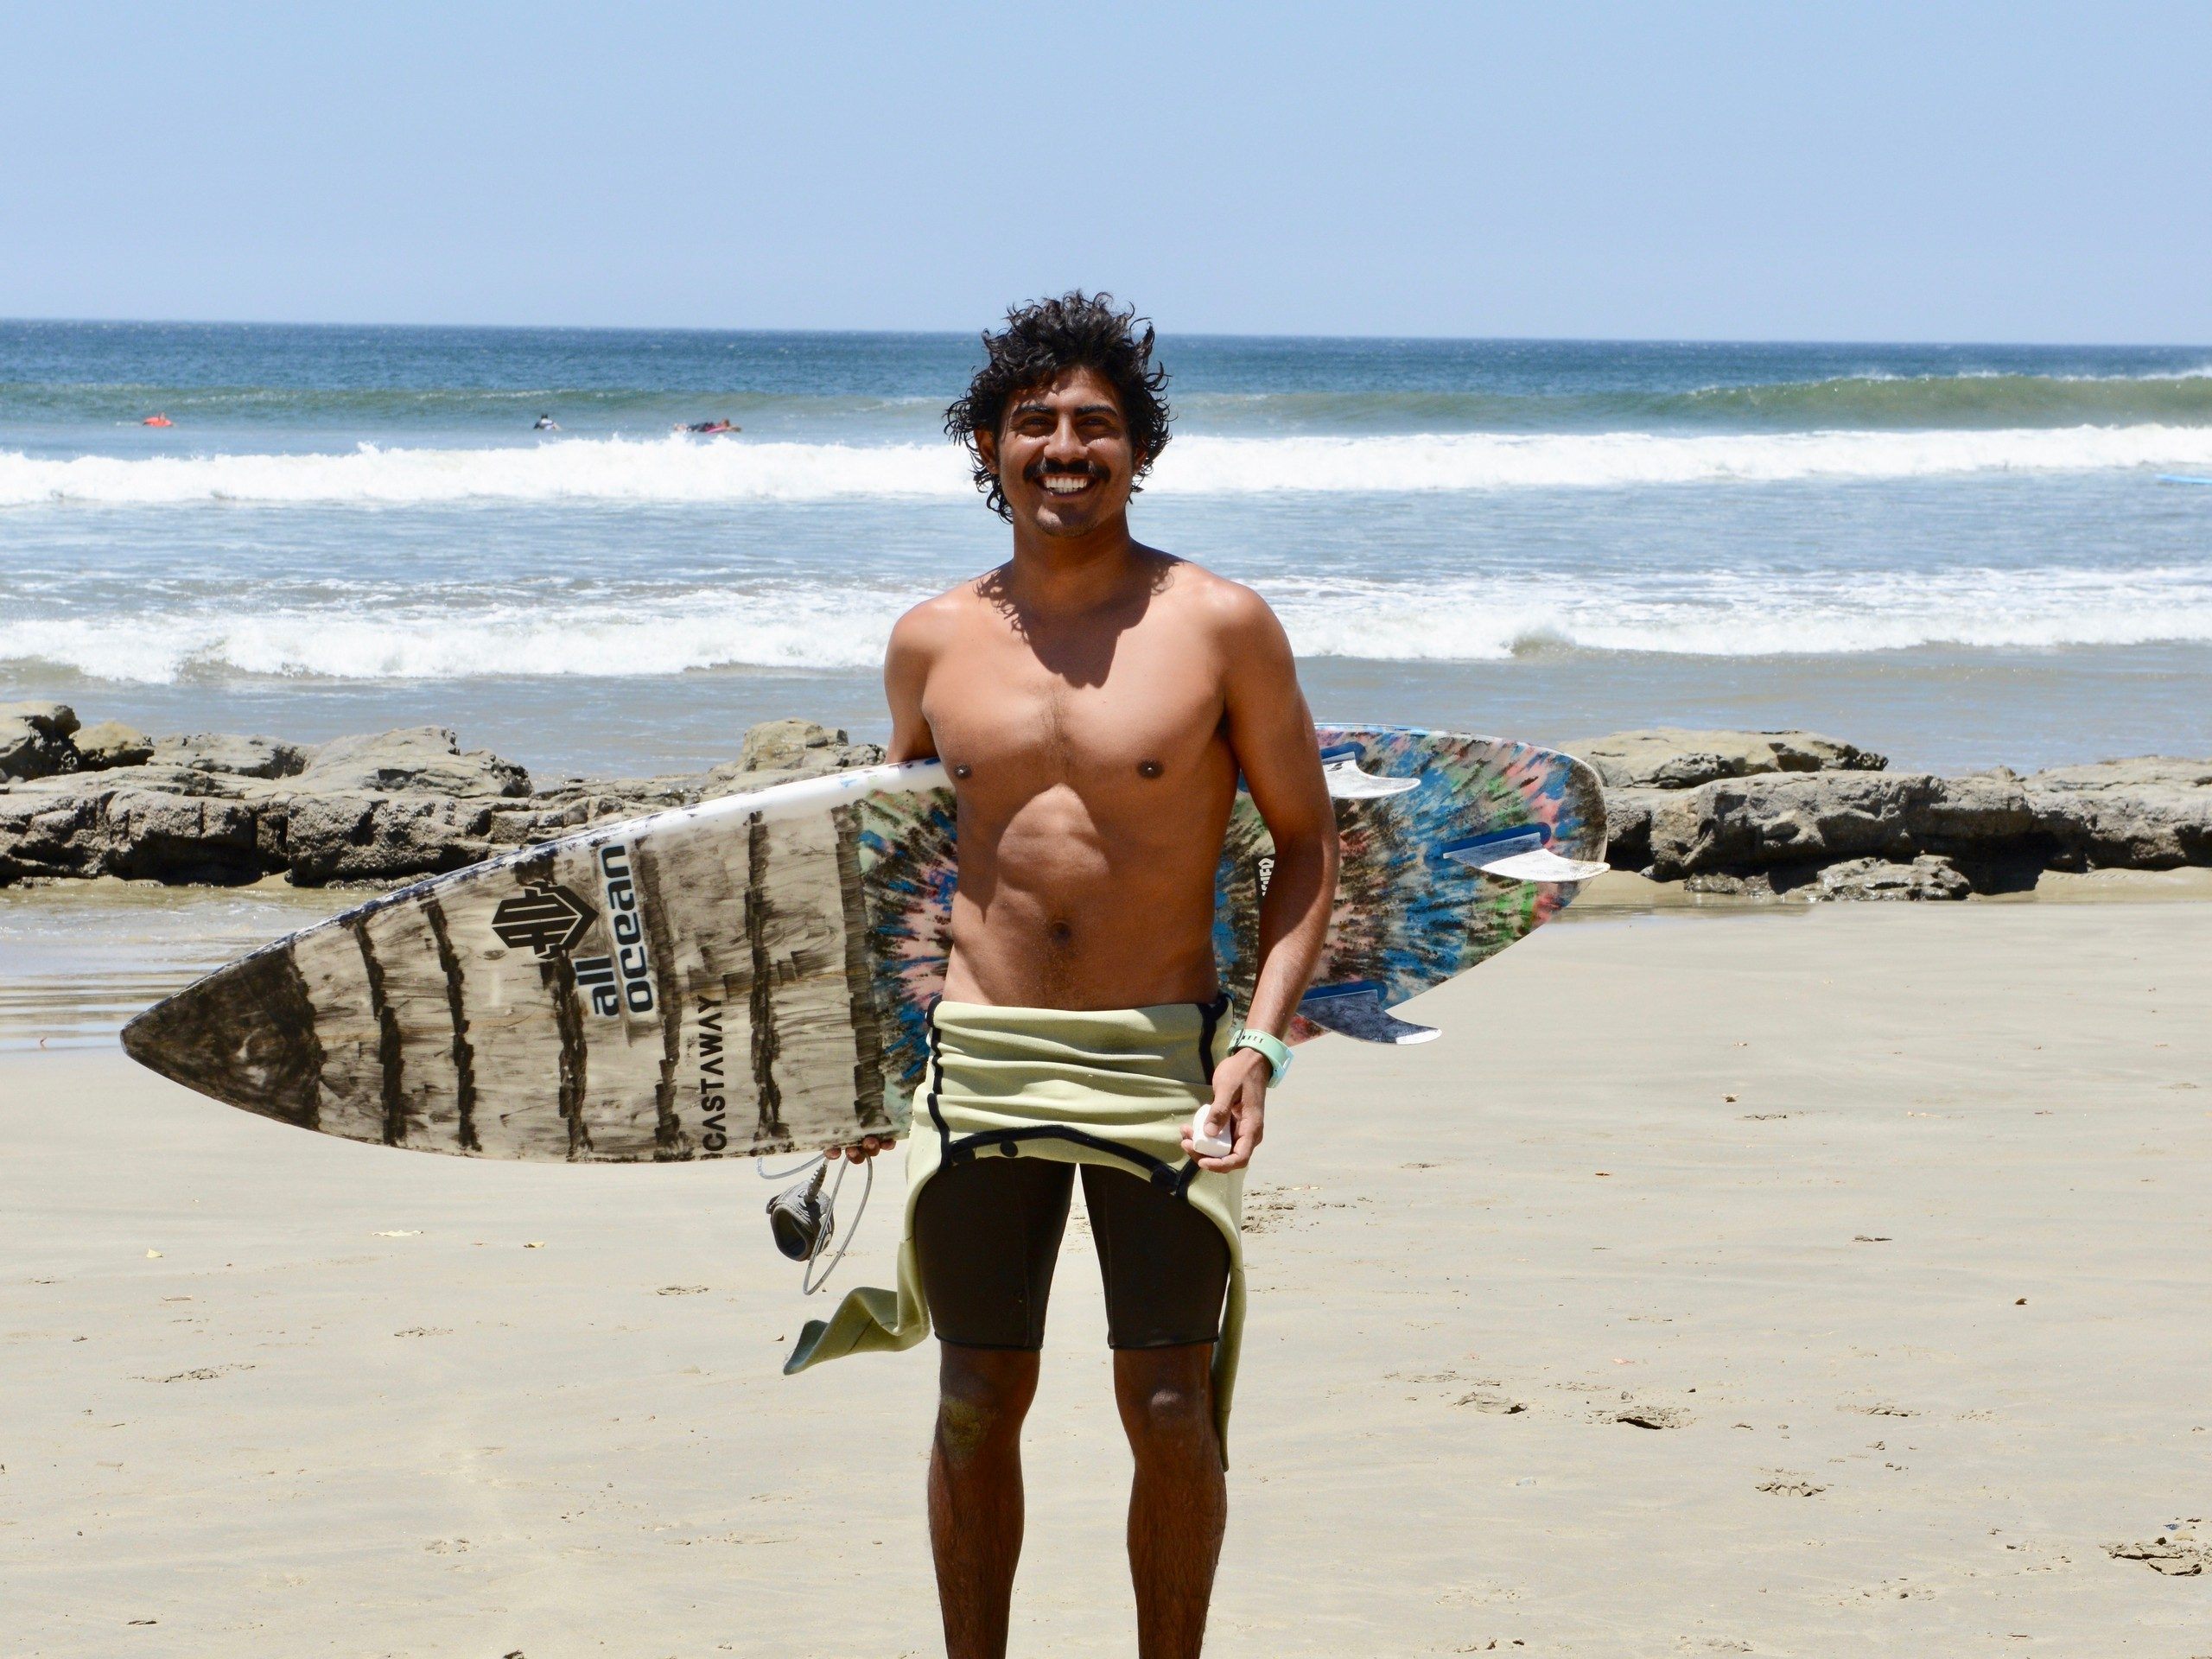 Surfboarder in San Juan del Sur, Nicaragua